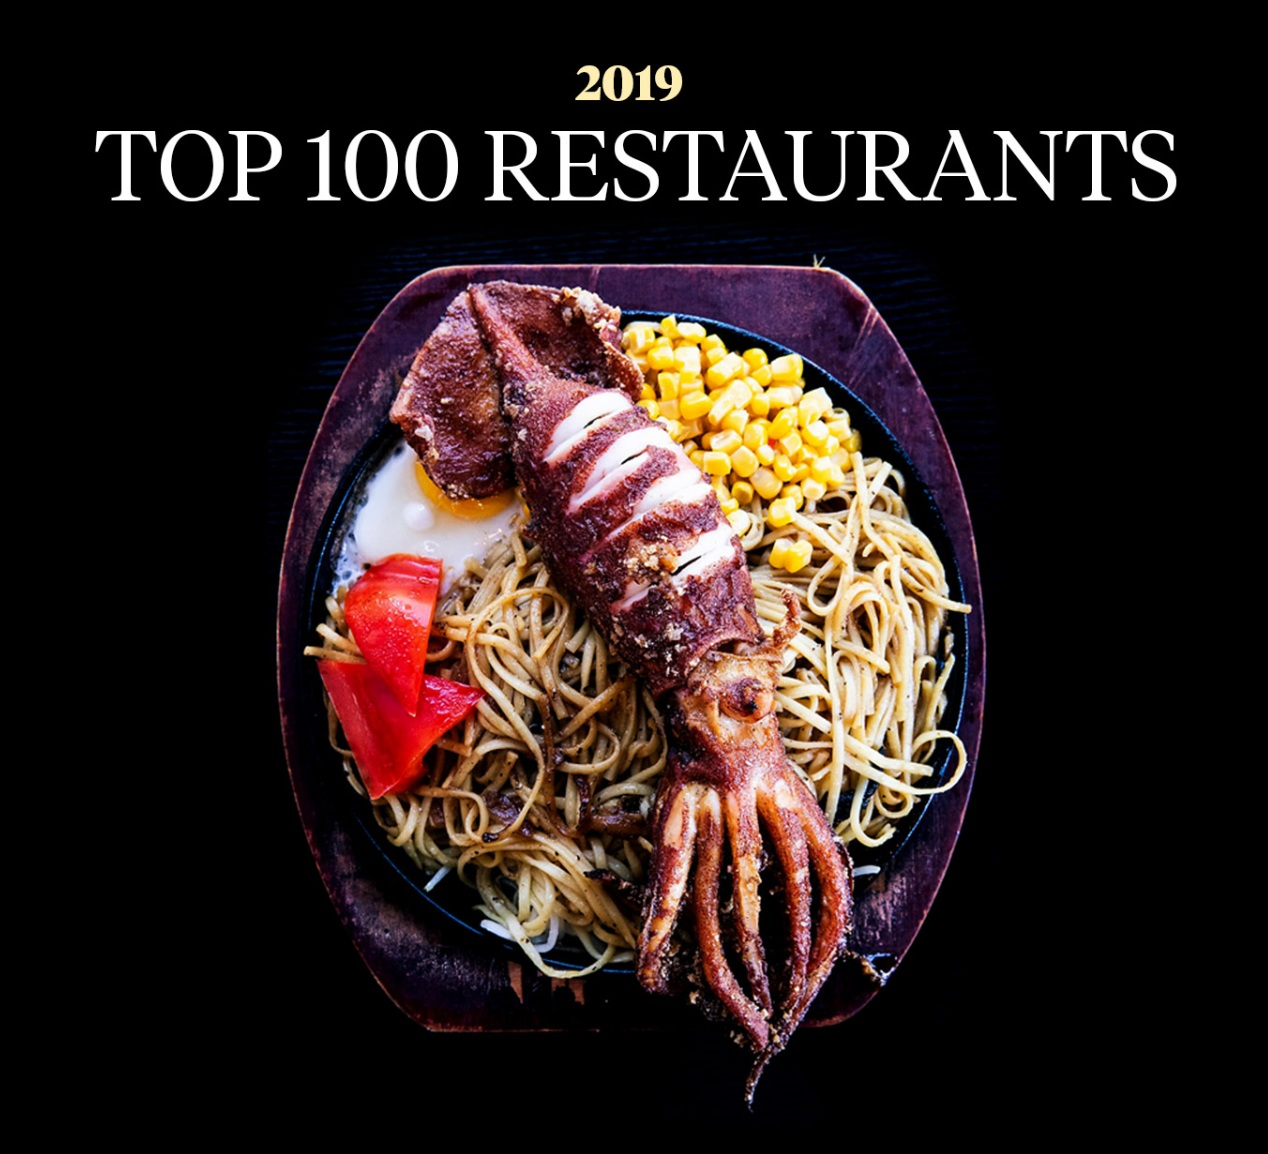 SAN FRANCISCO CHRONICLE^ TOP 100 2019 RESTAURANTS featuring PLAJ RESTAURANT